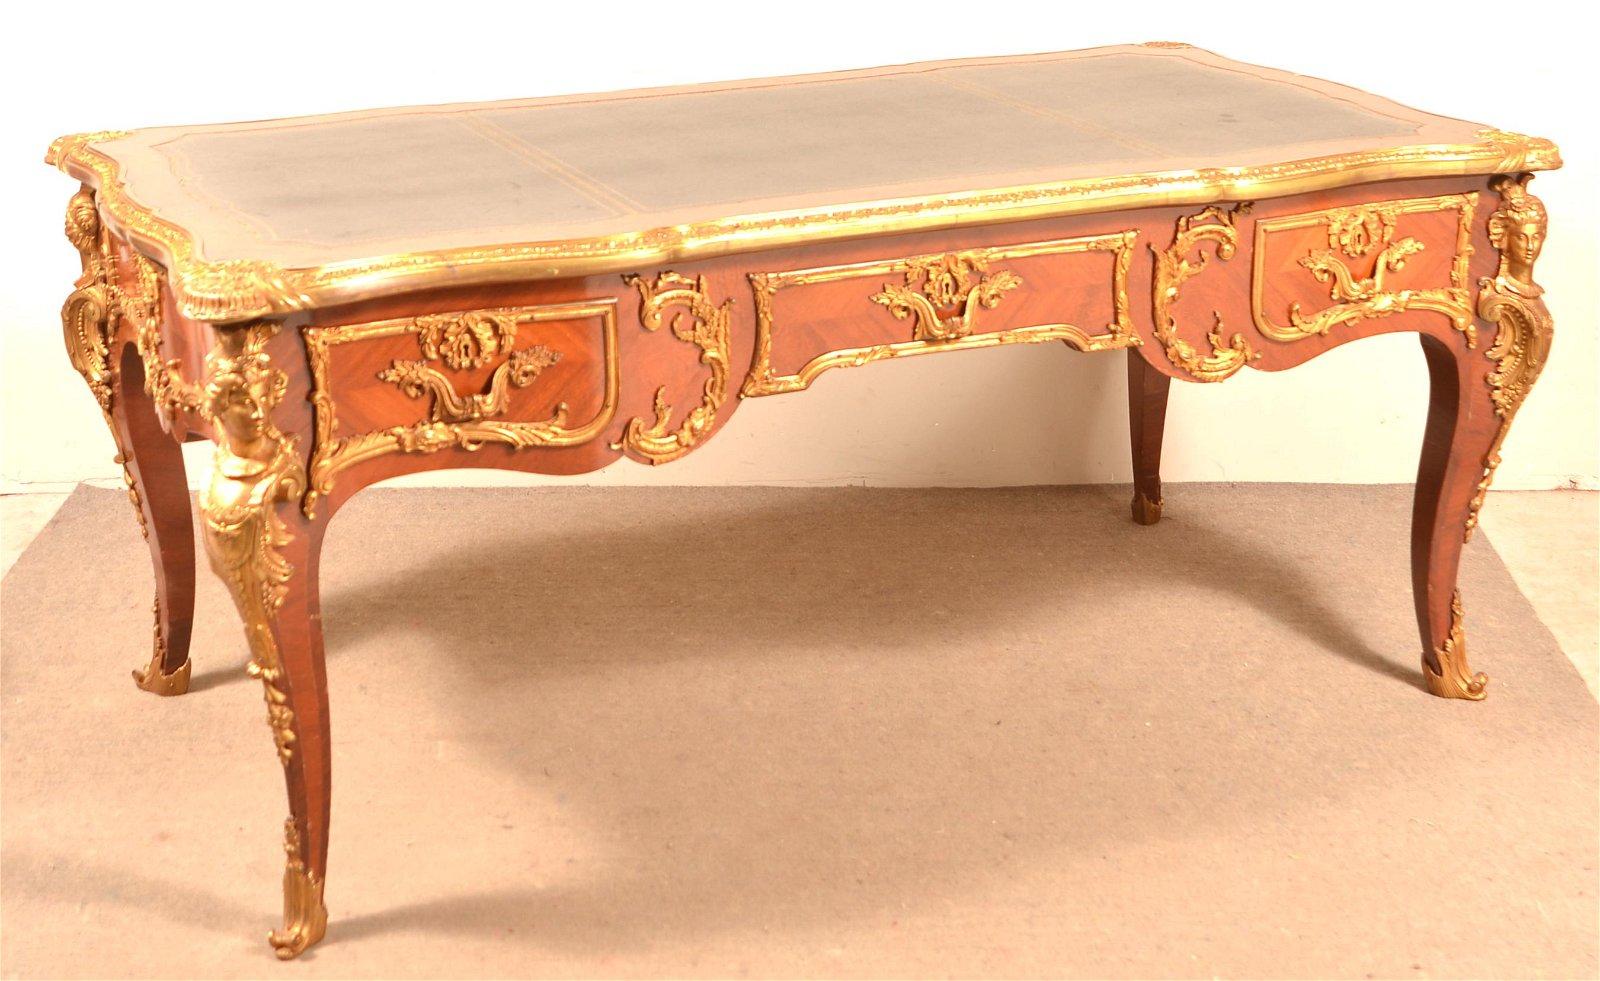 Vintage French Louis XV Style Bureau Plat Desk.